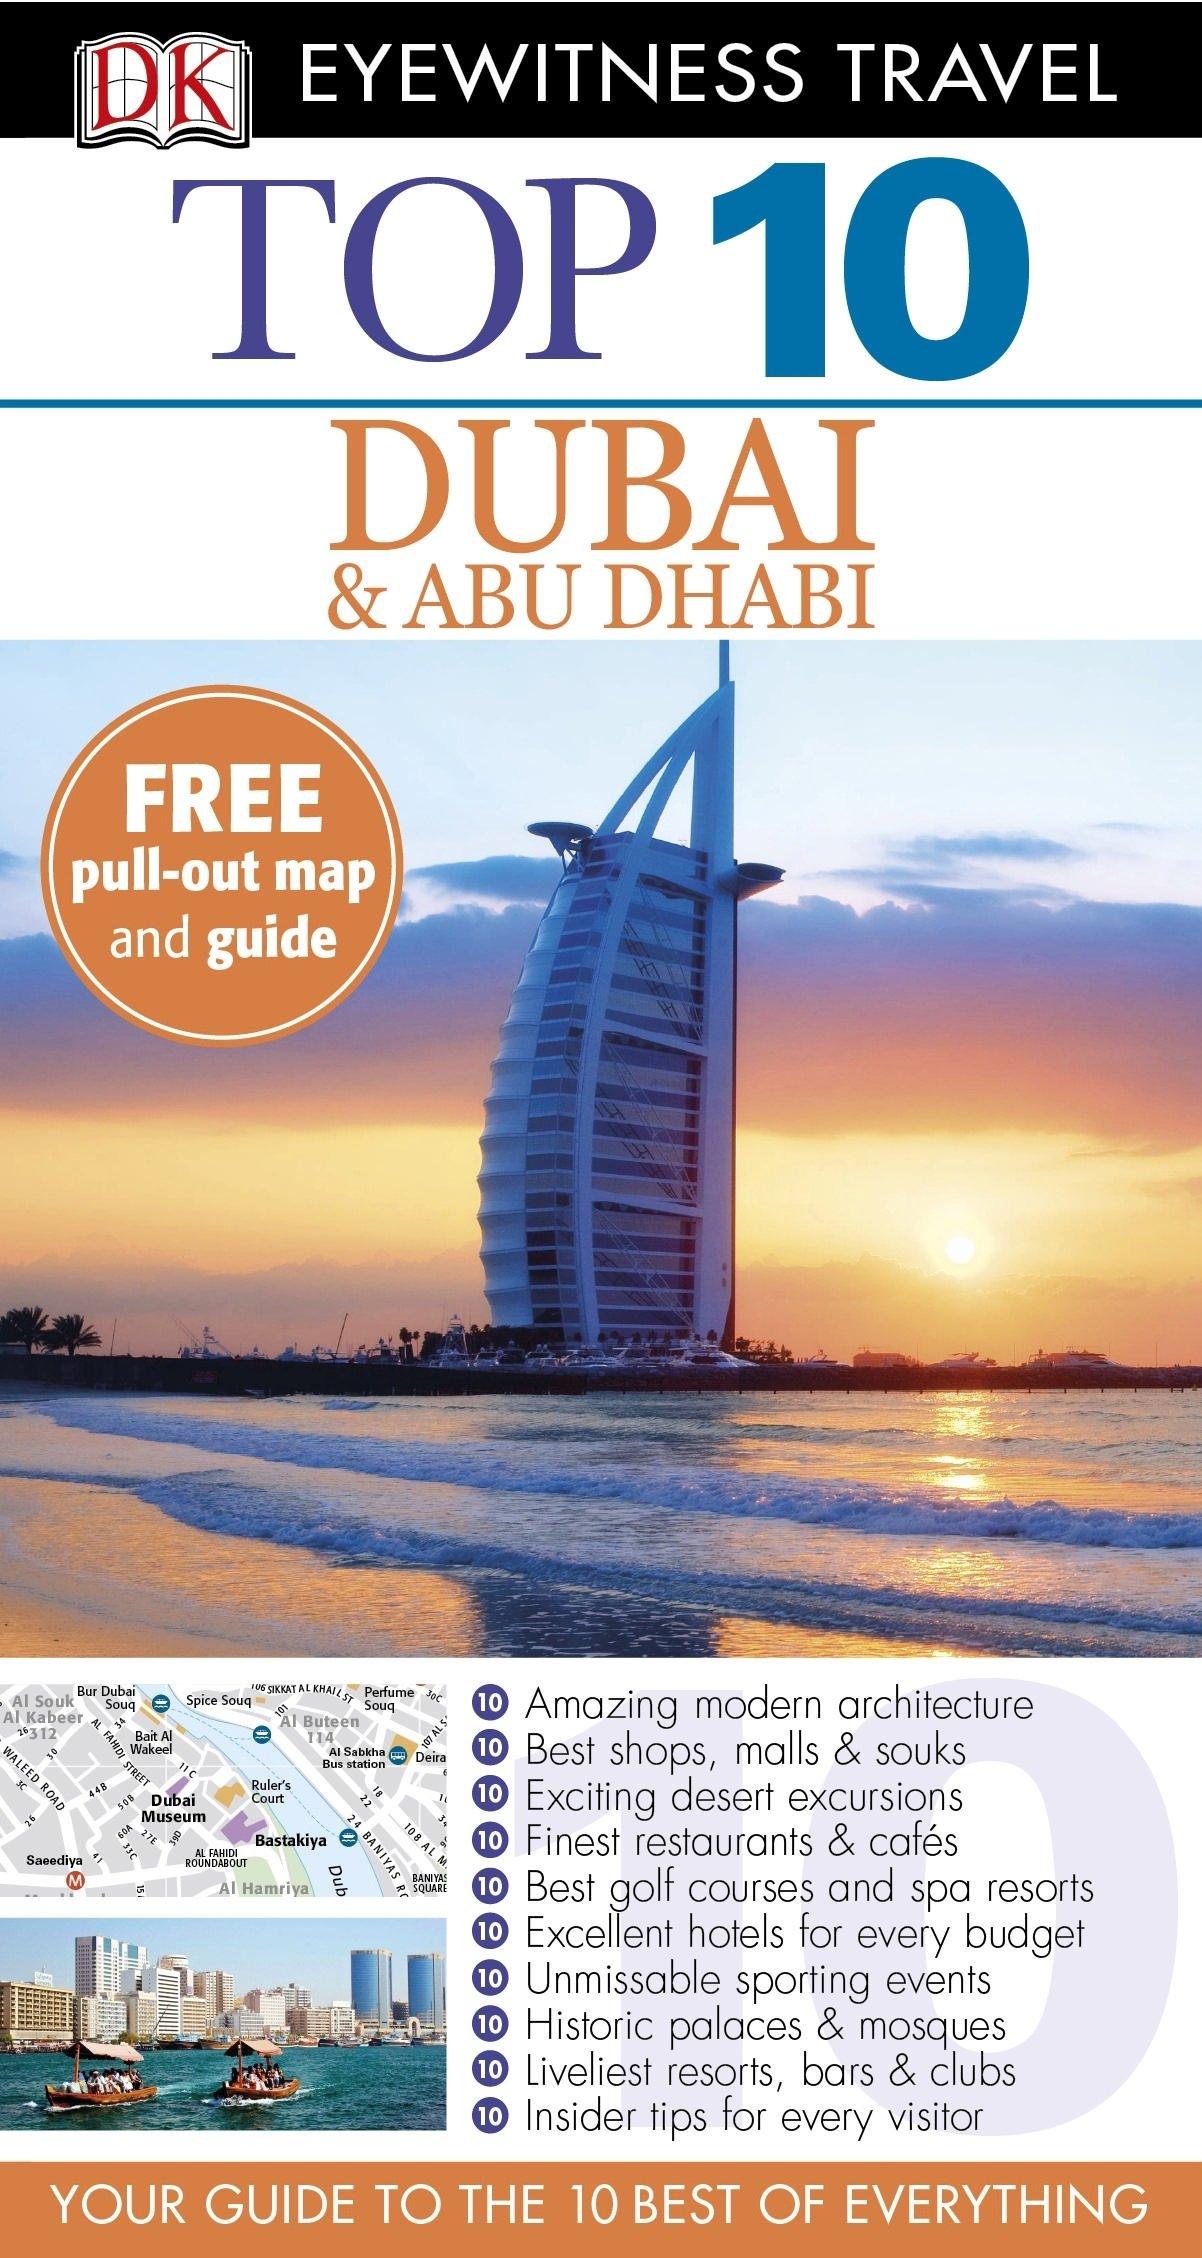 035cc191e91 Top 10 Dubai and Abu Dhabi (DK Eyewitness Travel Guide) Paperback –  September 3, 2012